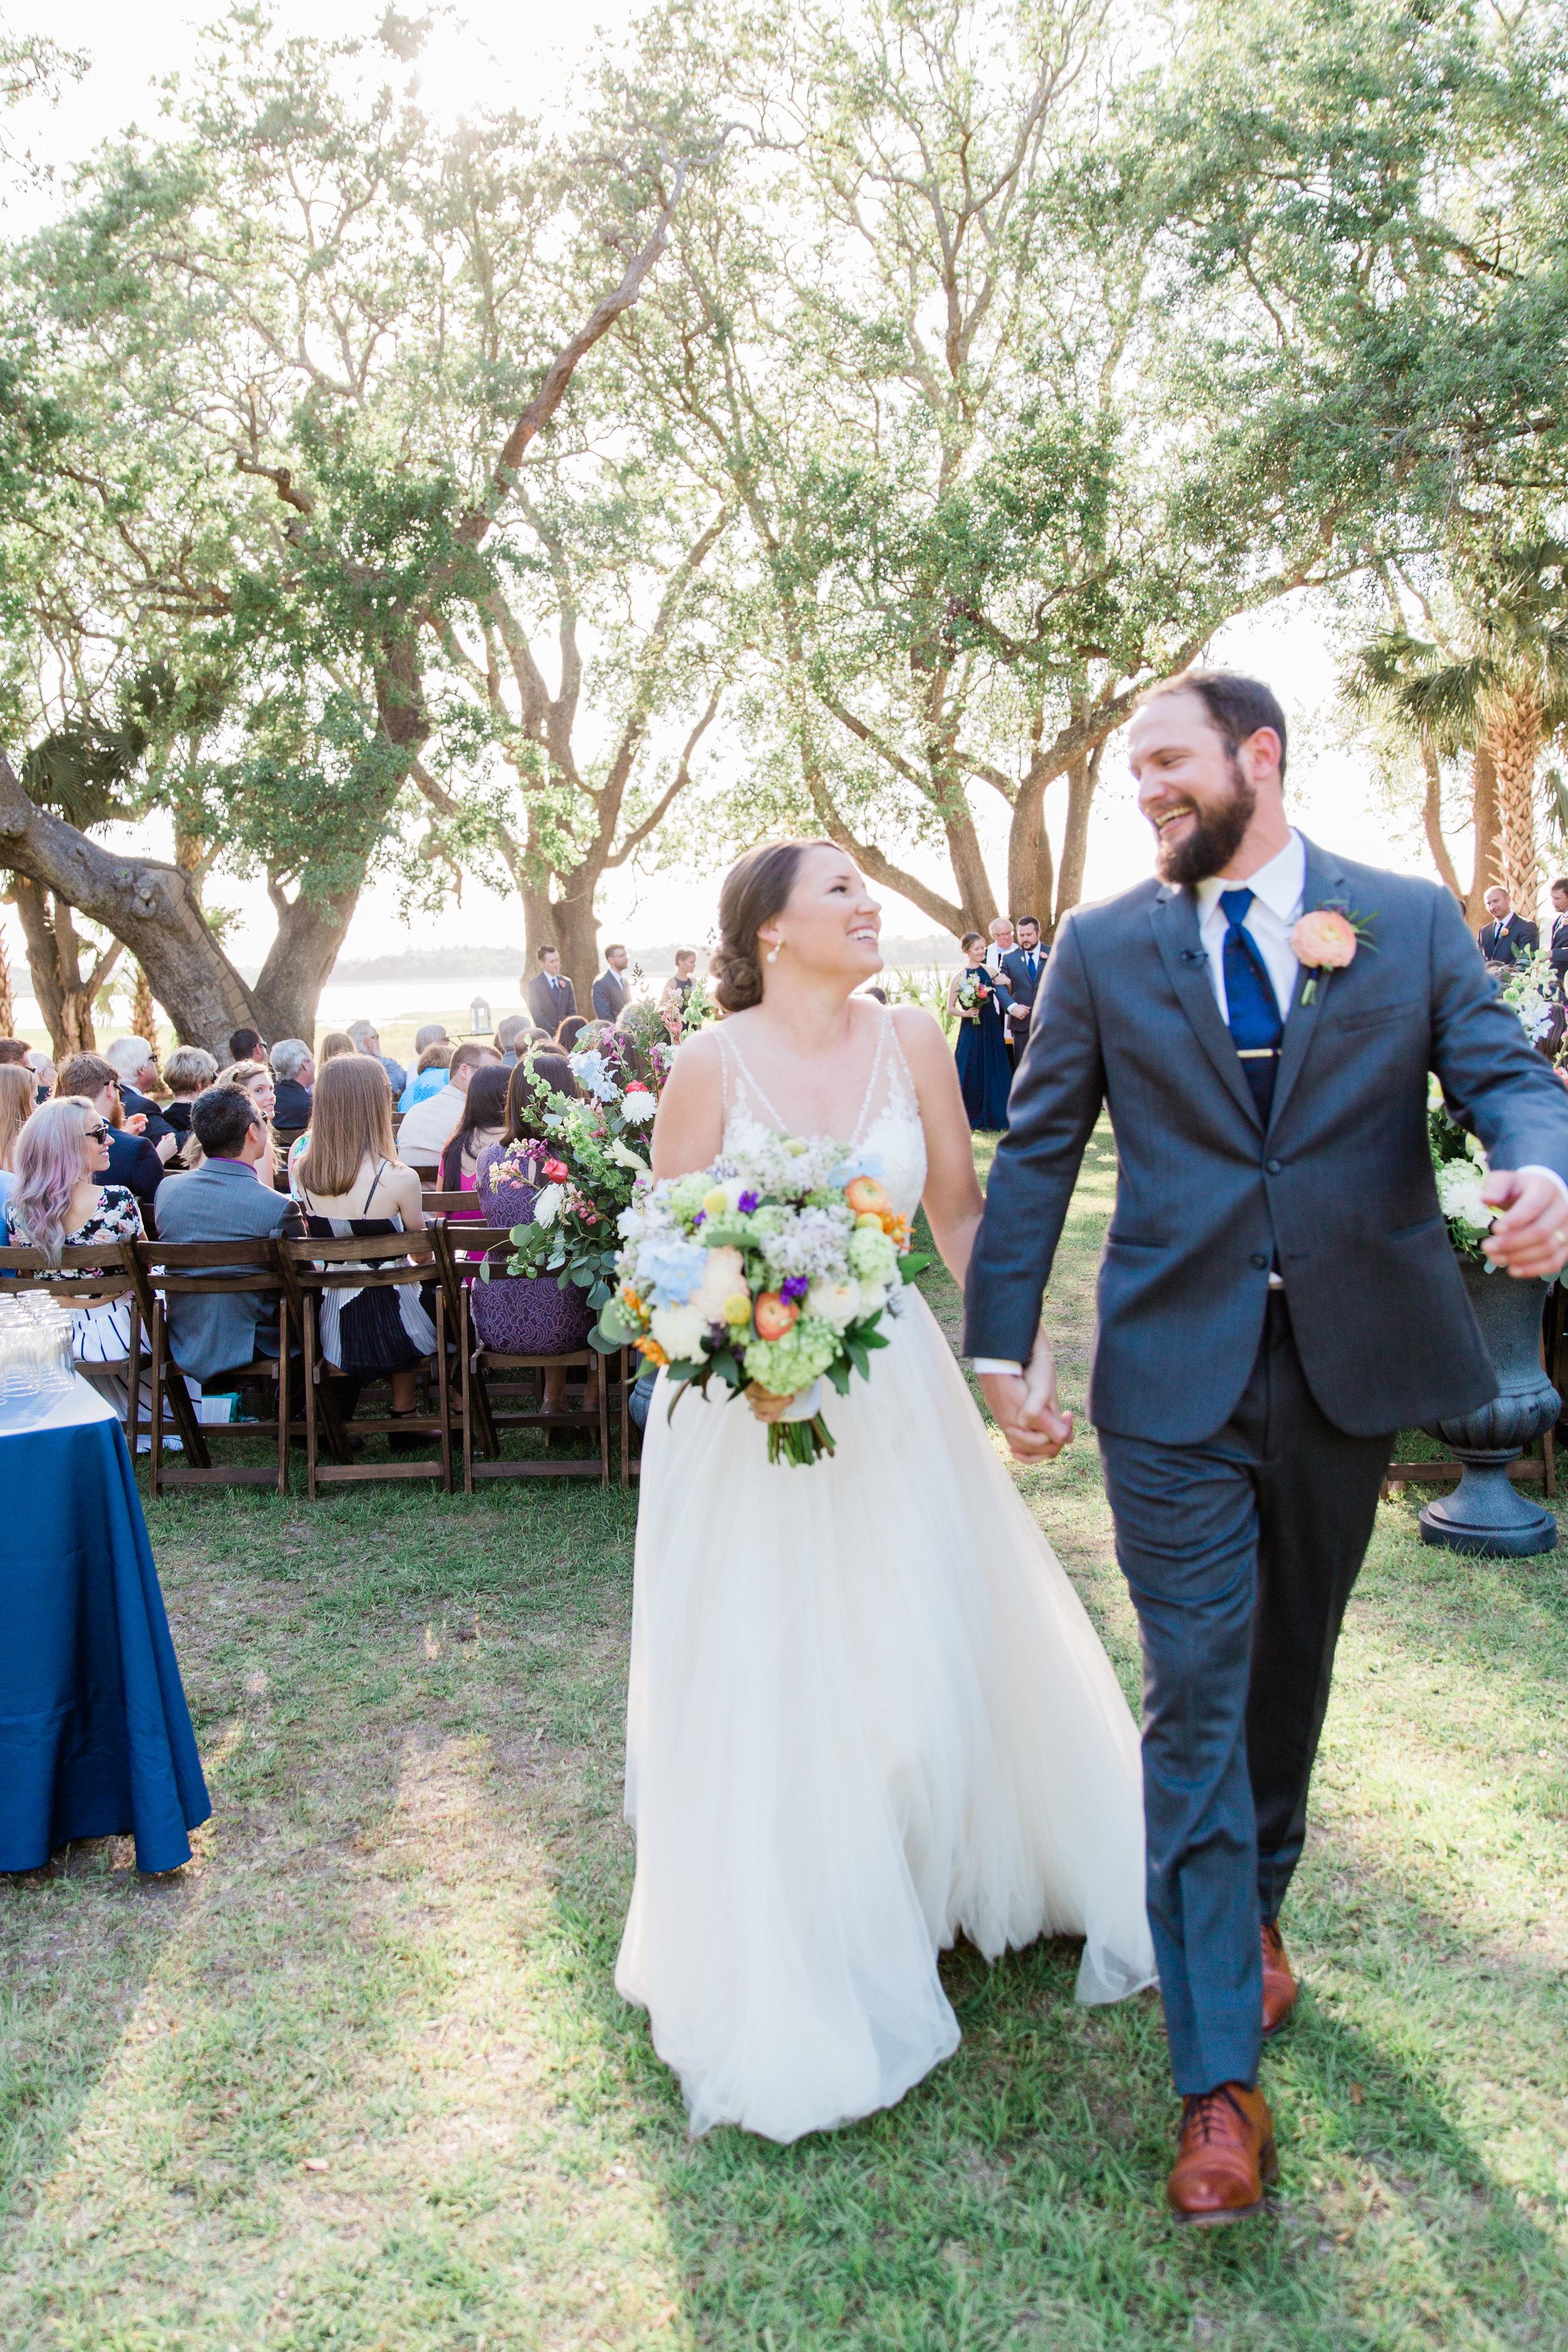 A Lowndes Grove Plantation Charleston Wedding - The Overwhelmed Bride Wedding Ideas Inspiration Blog